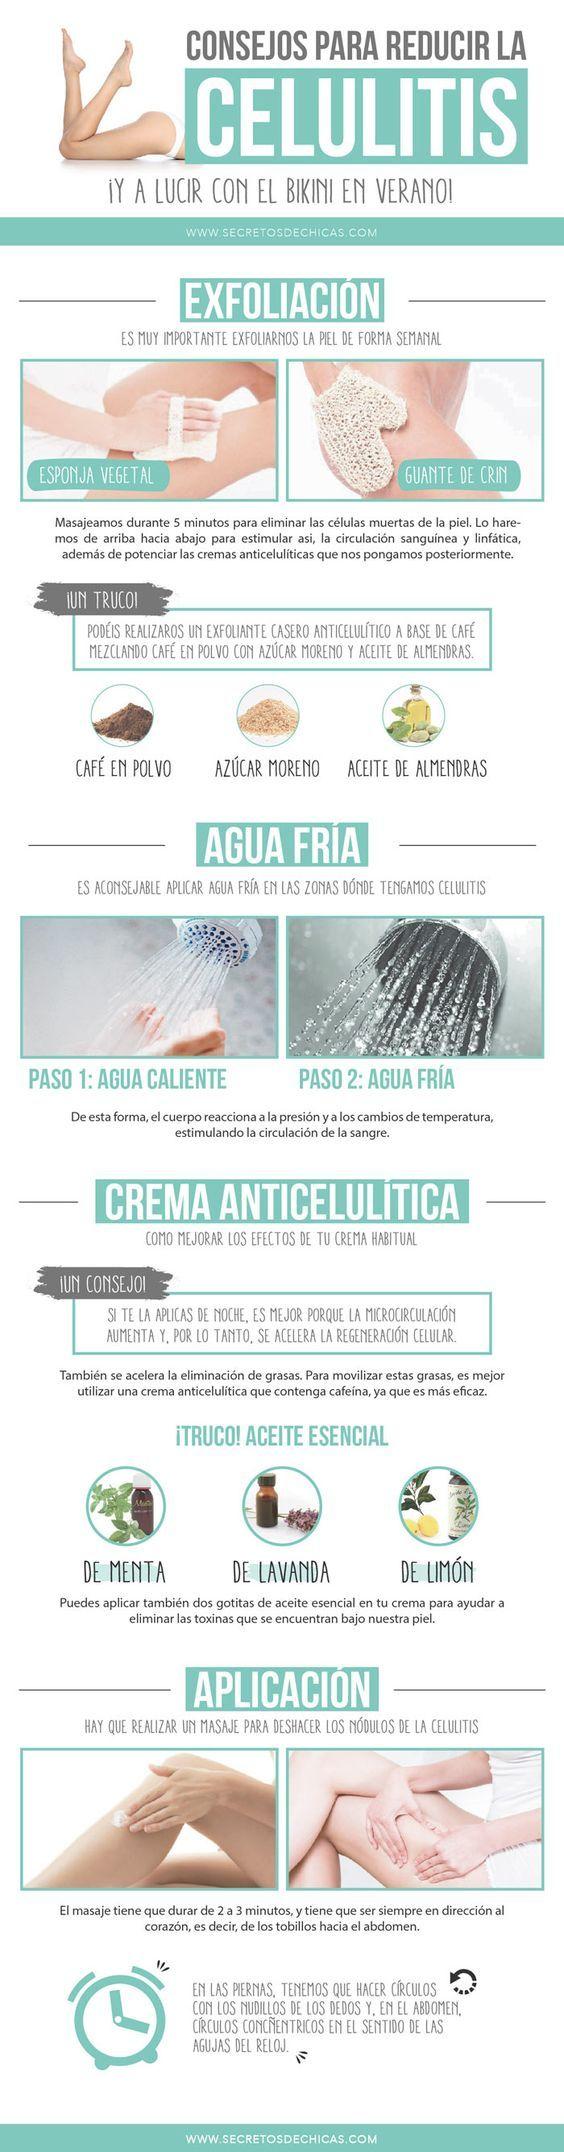 Reduce la celulitis y siéntete segura de tu apariencia